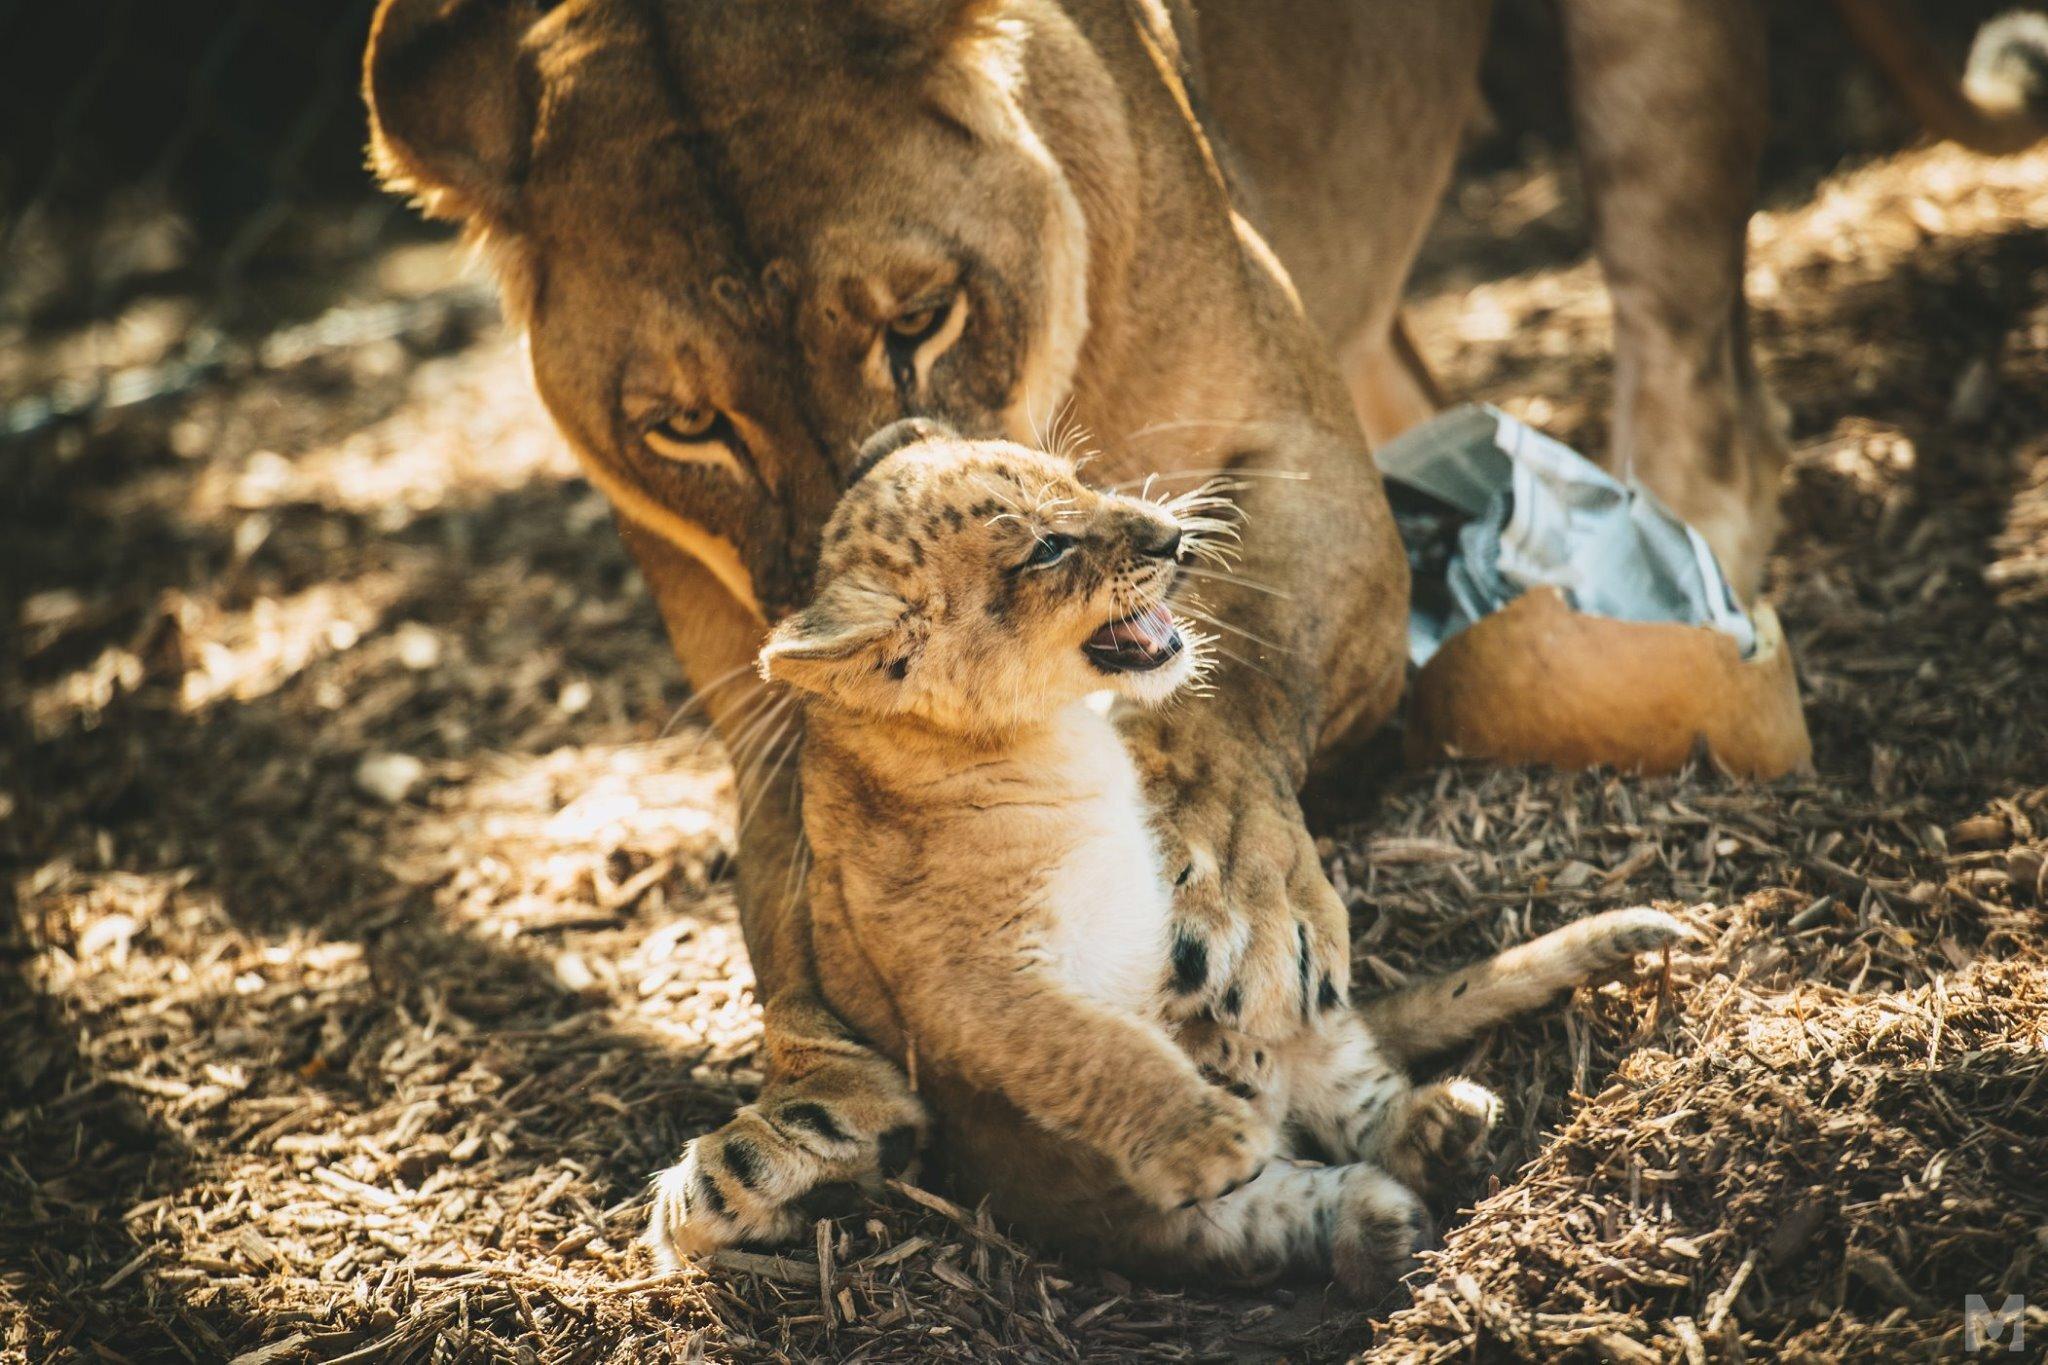 Lion Cub_5_Molly McCormick.jpg